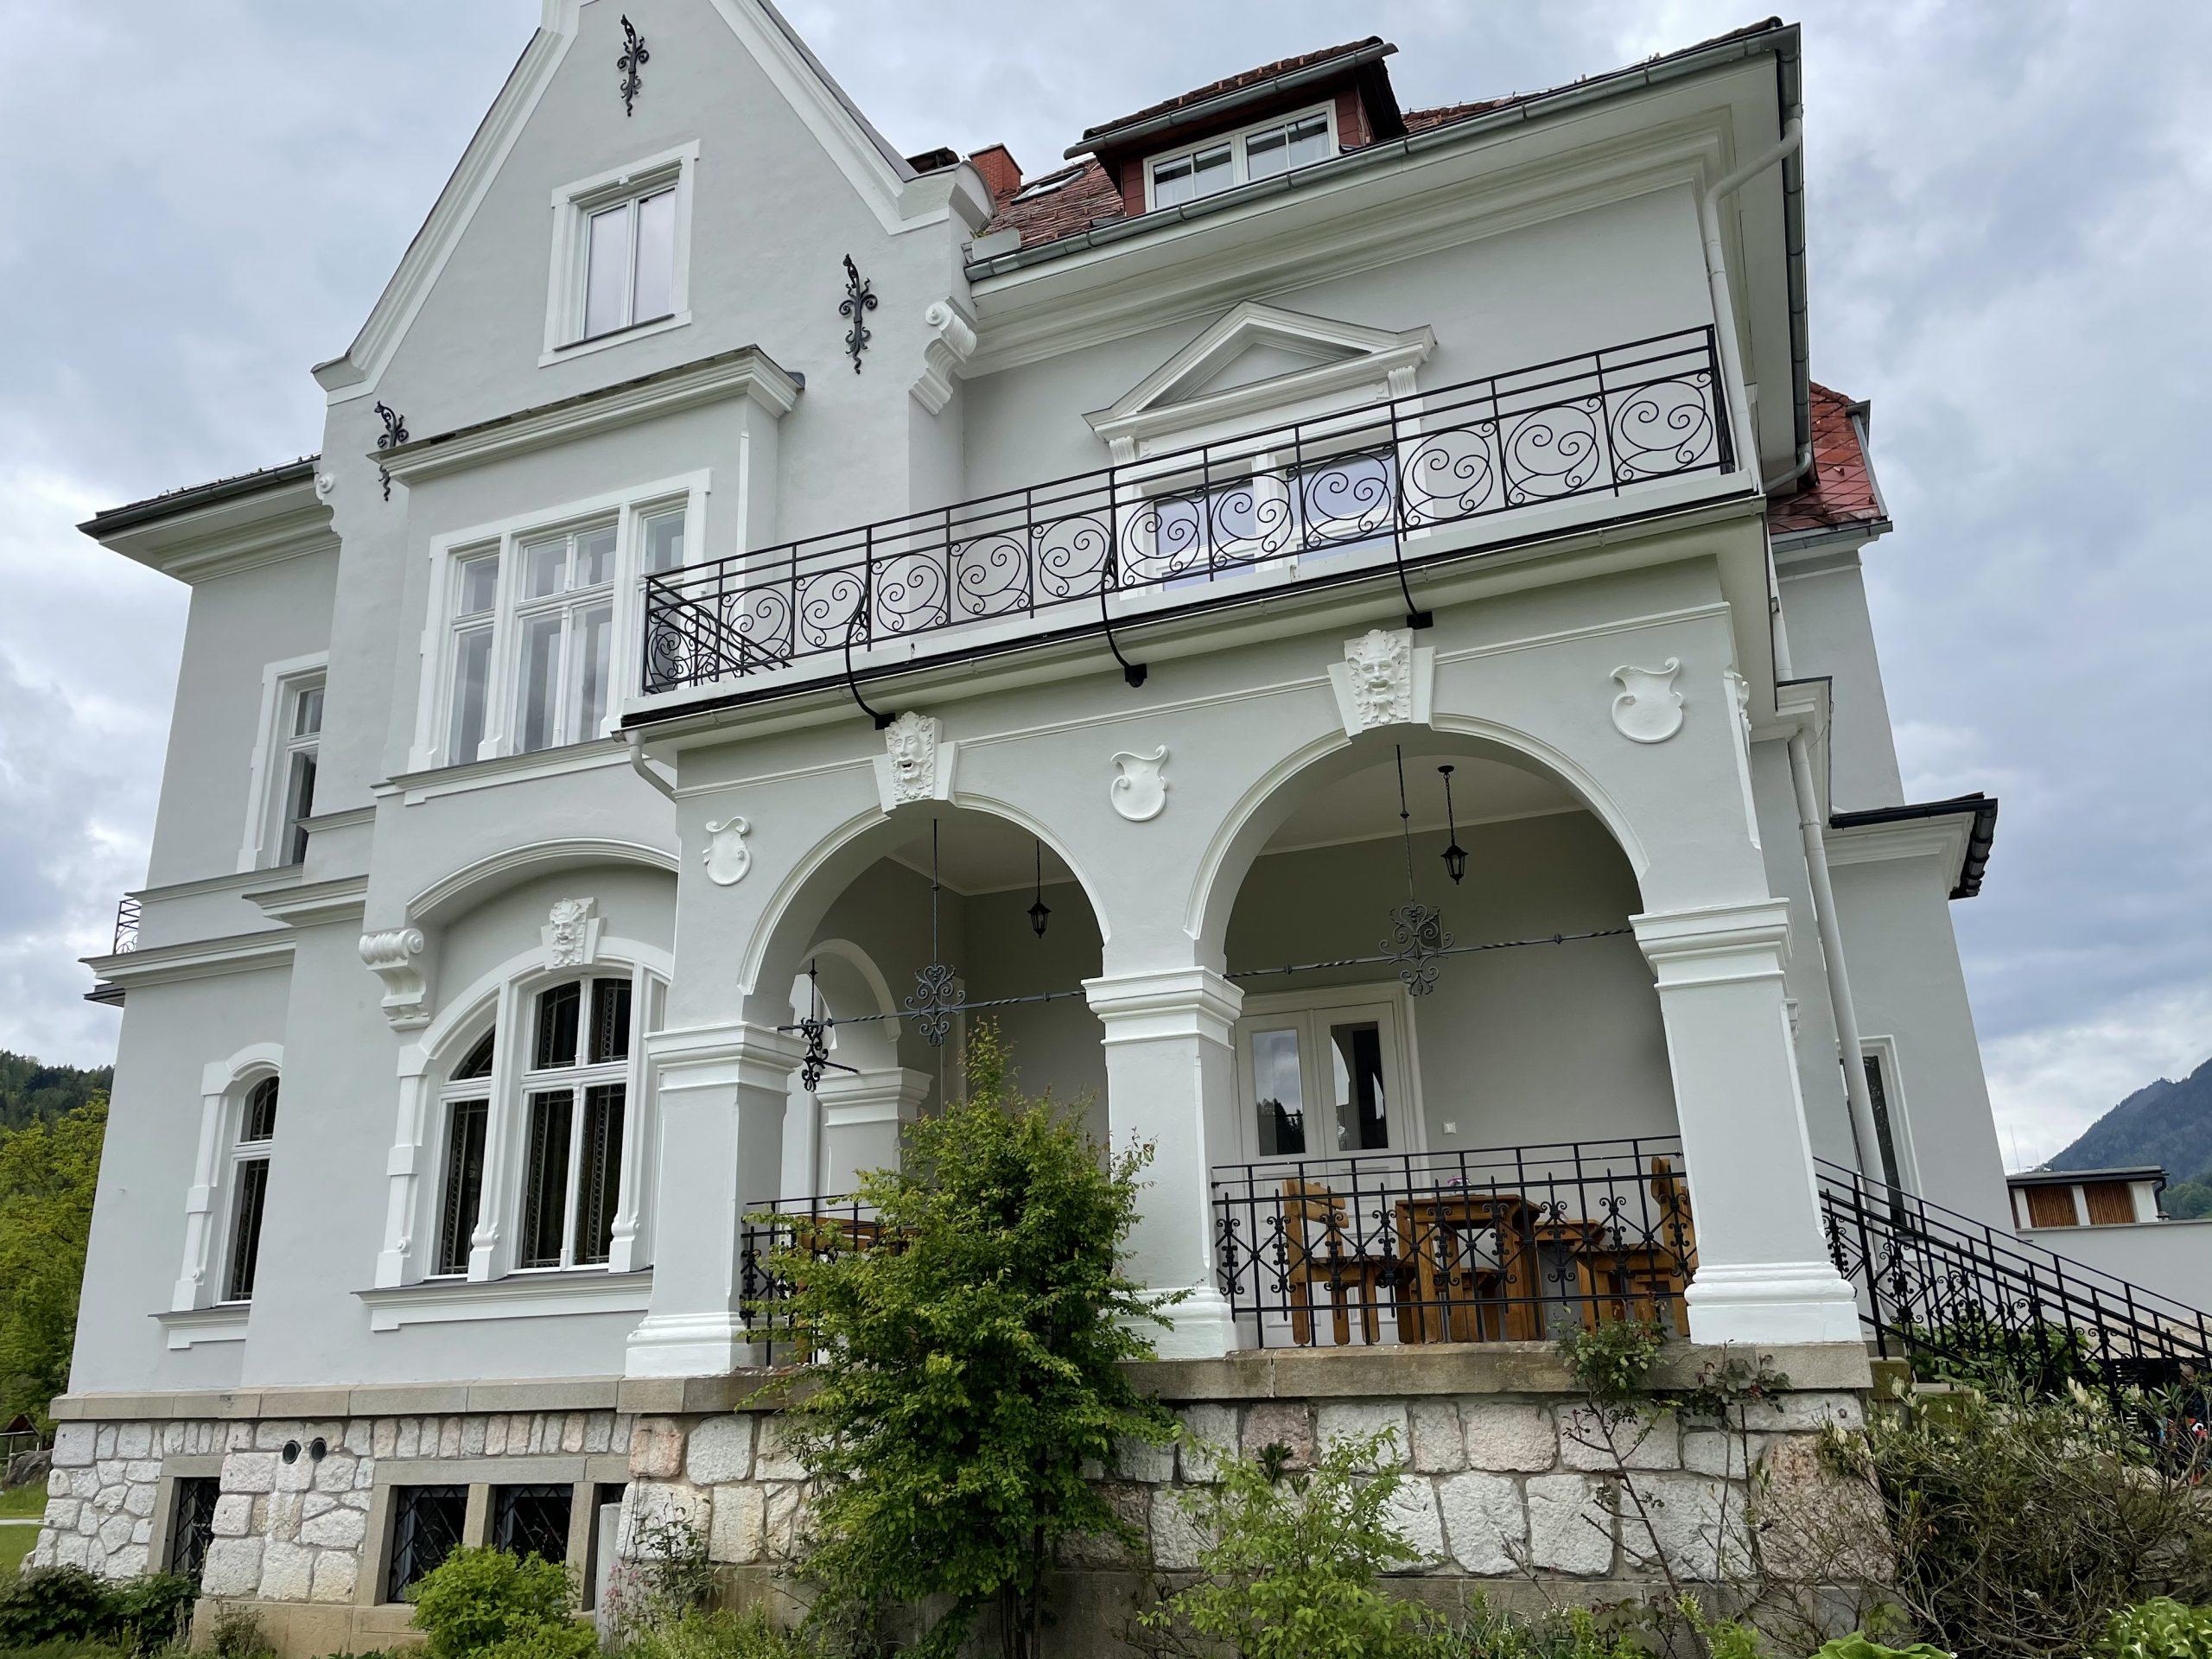 Villa Bergzauber exclusive Austrian wedding location